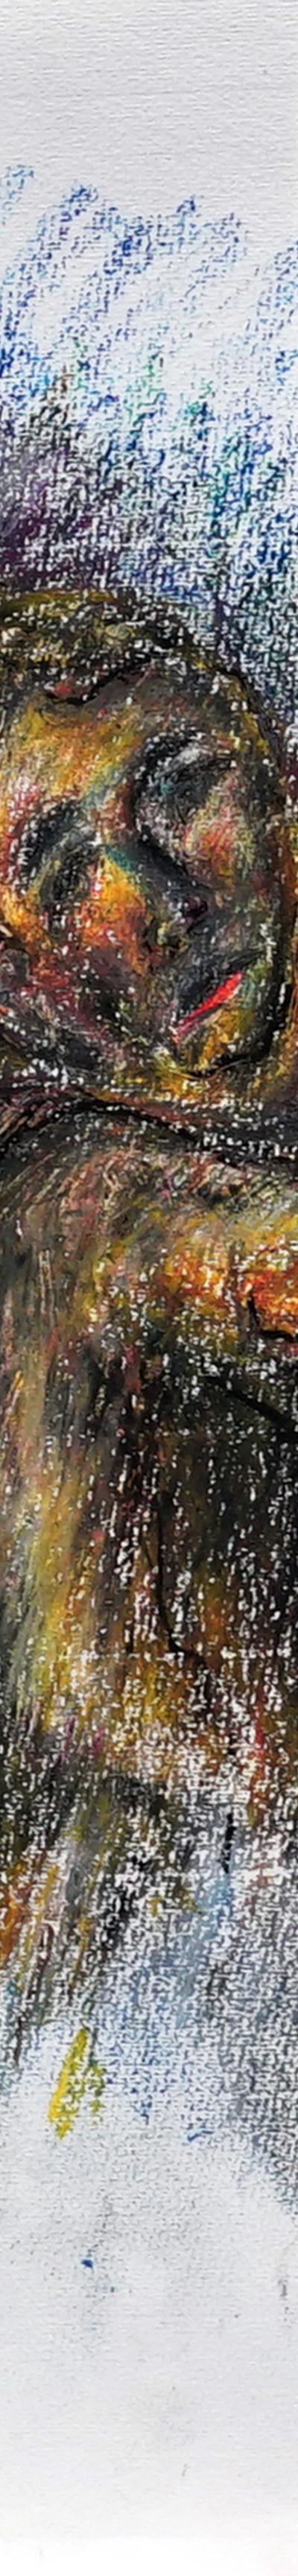 21x29,7 cm, oil on paper